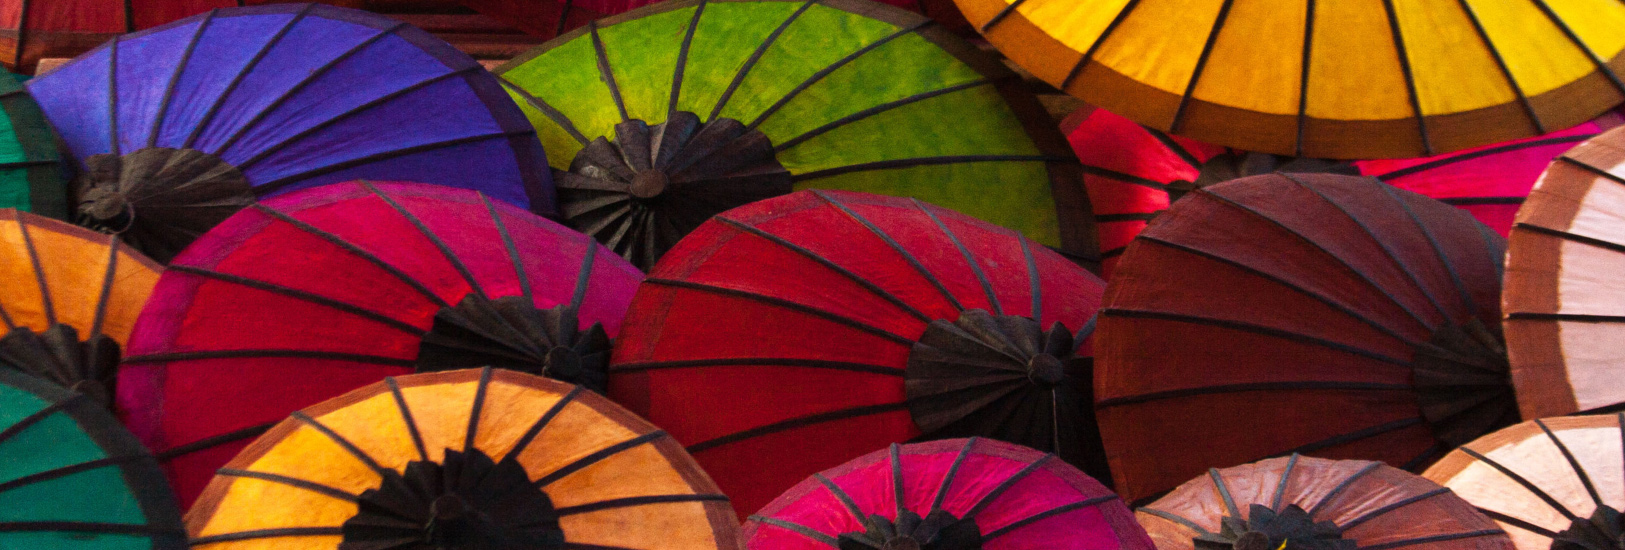 banner-umbrellas